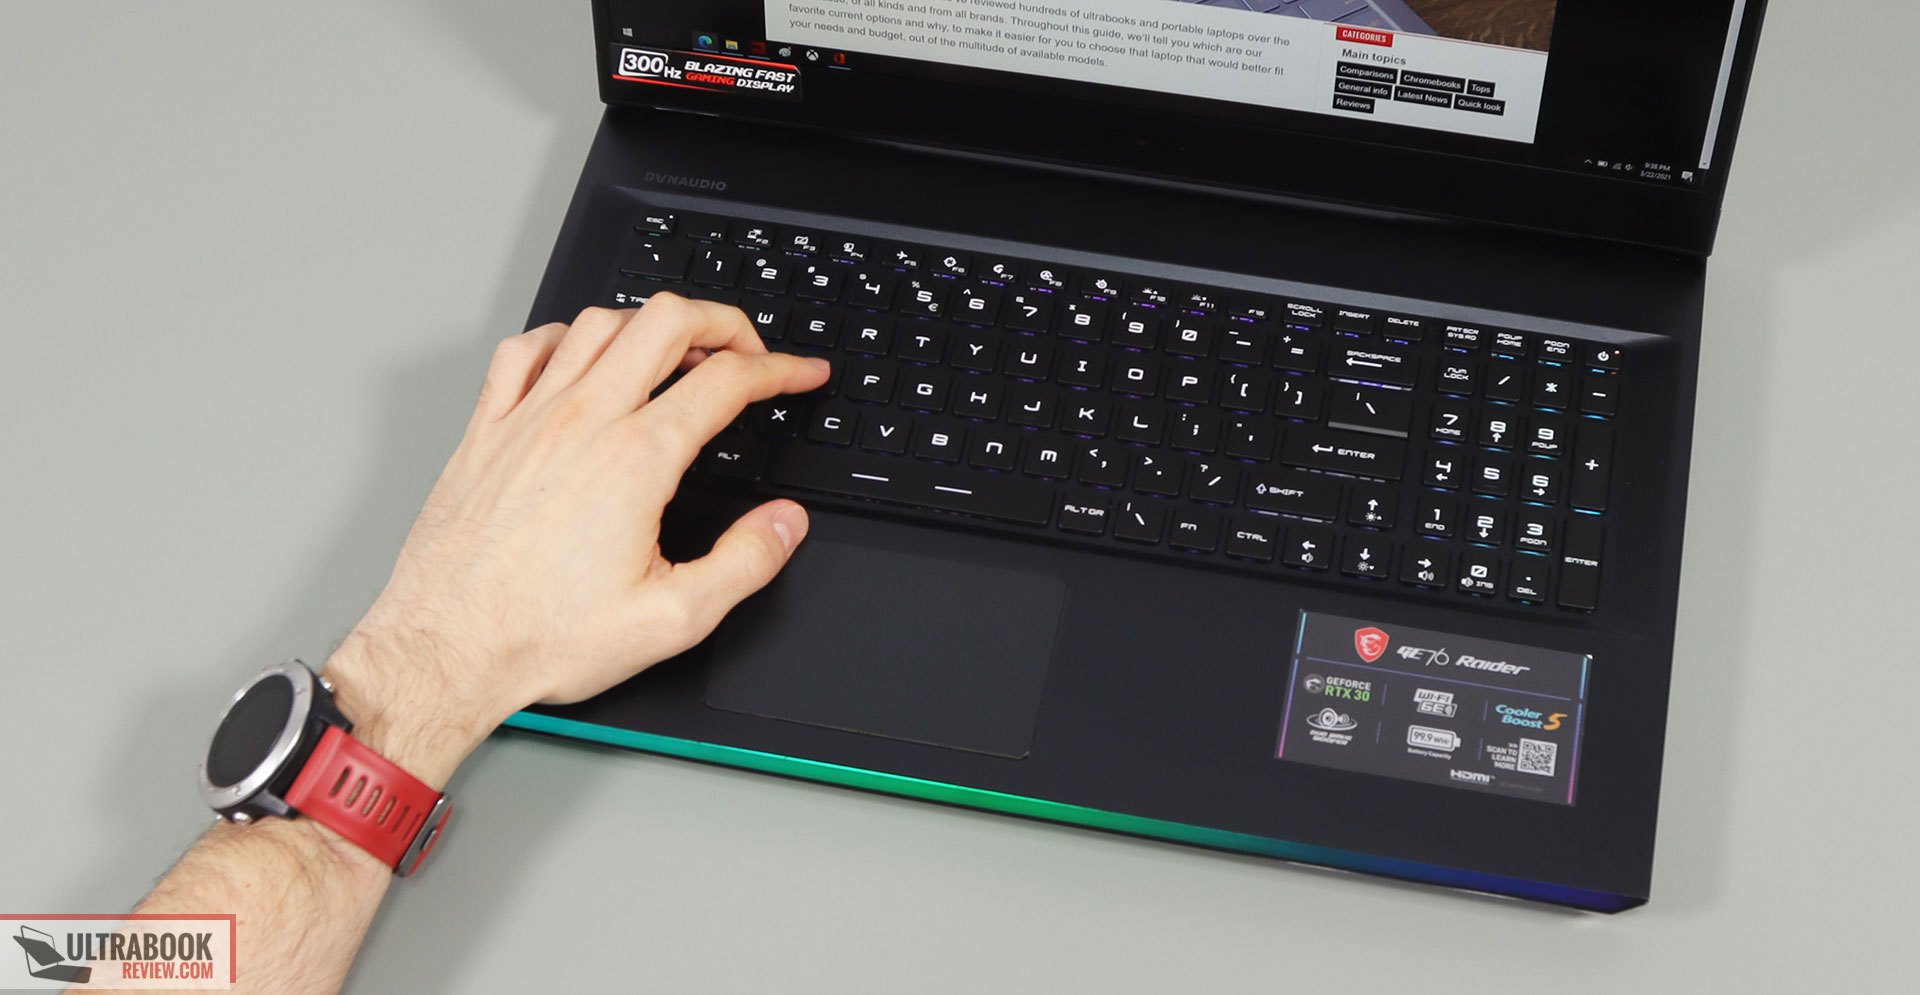 MSI GE76 Raider keyboard and clickpad